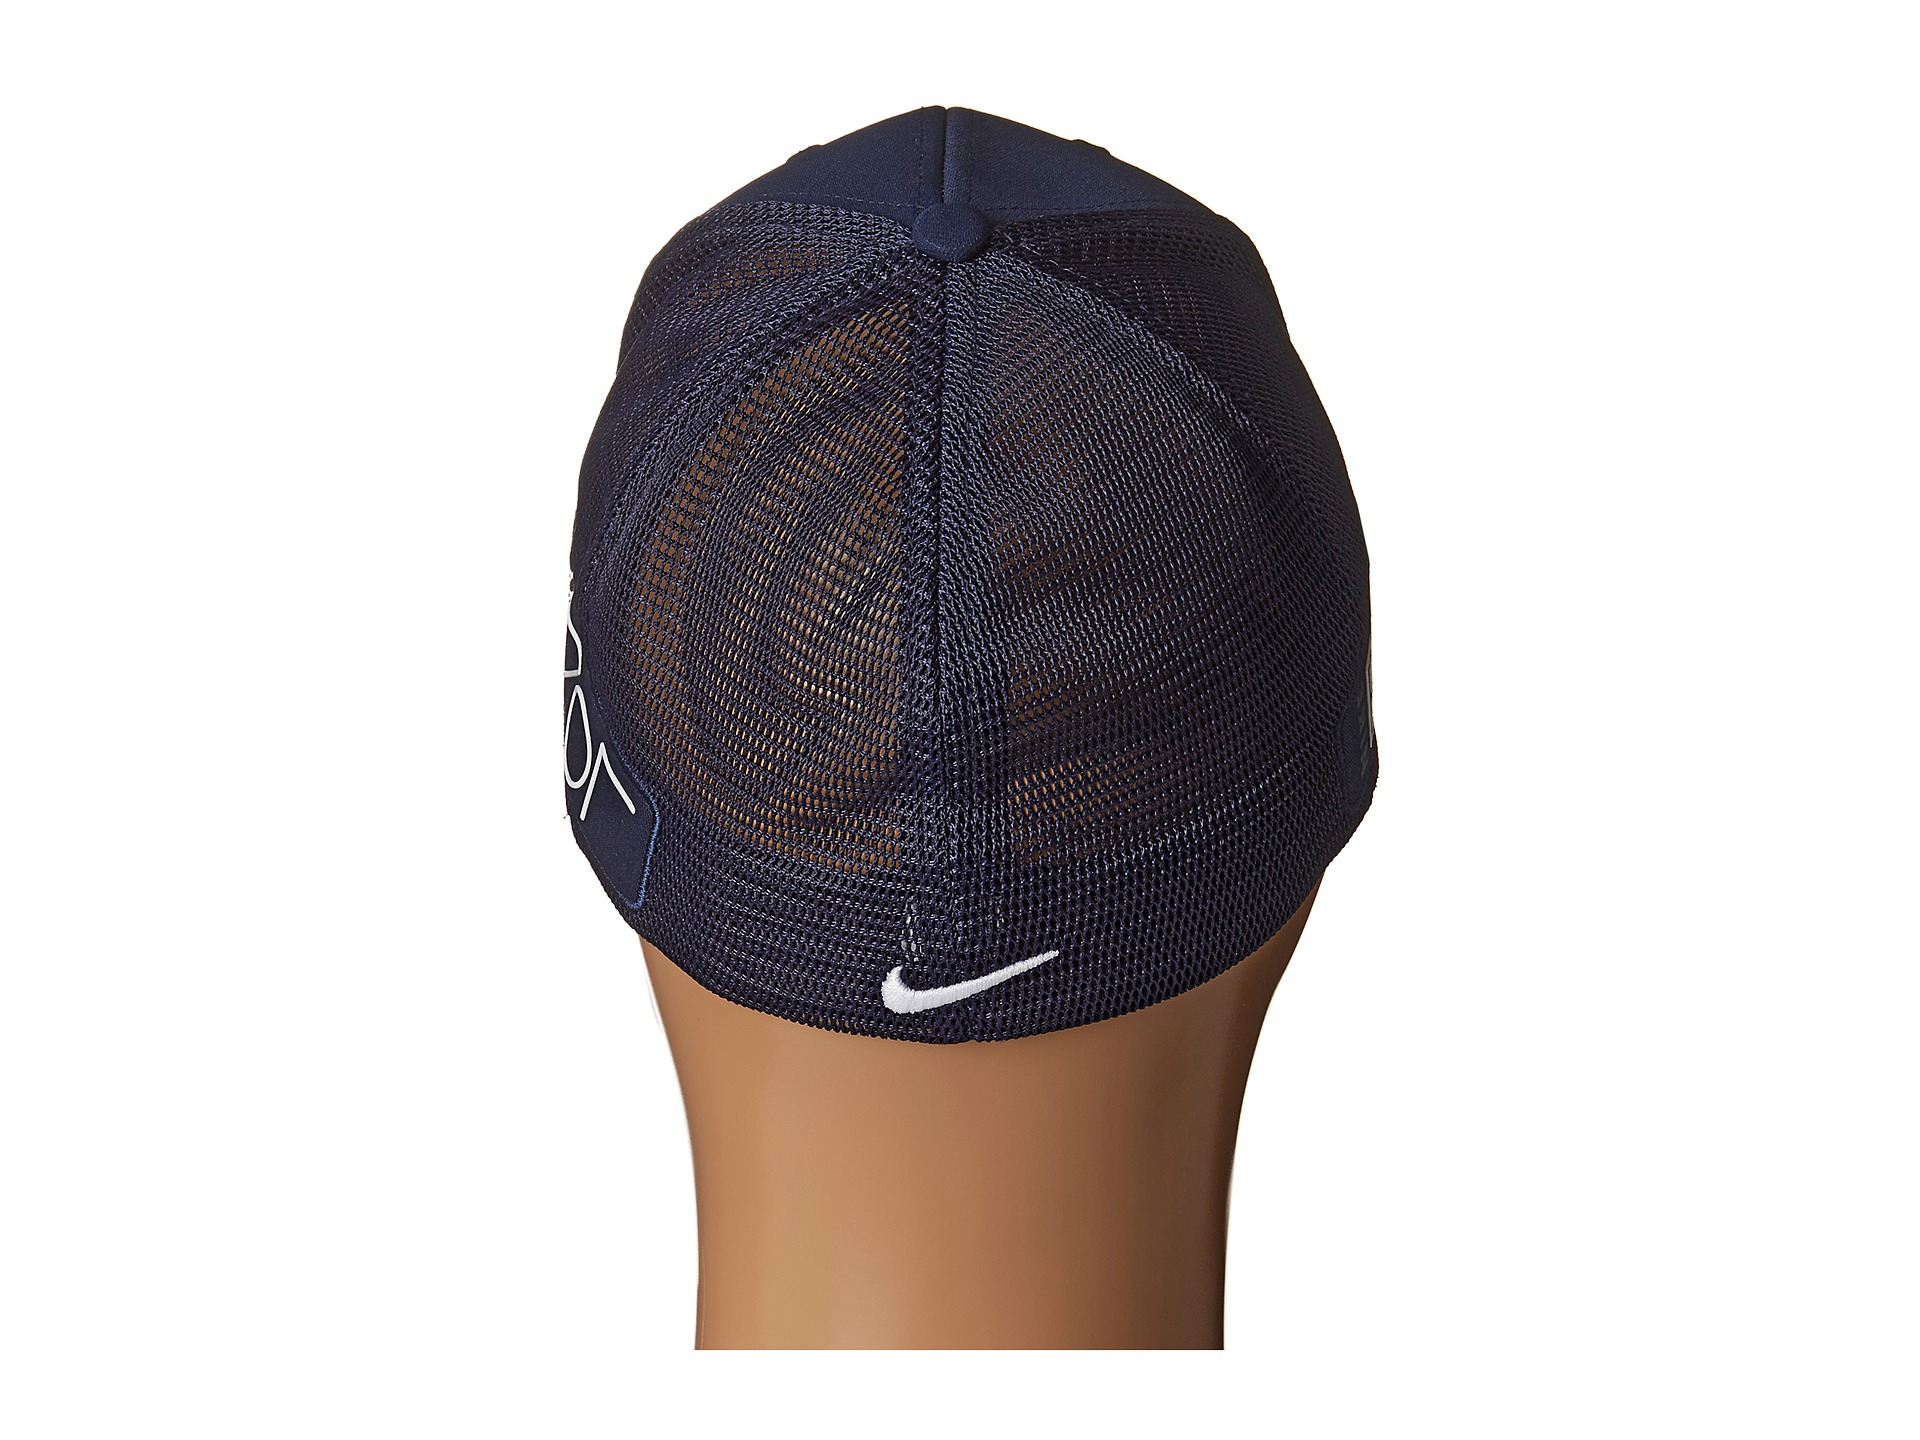 Lyst - Nike Tour Legacy Mesh Cap in Blue for Men a311301df3a1